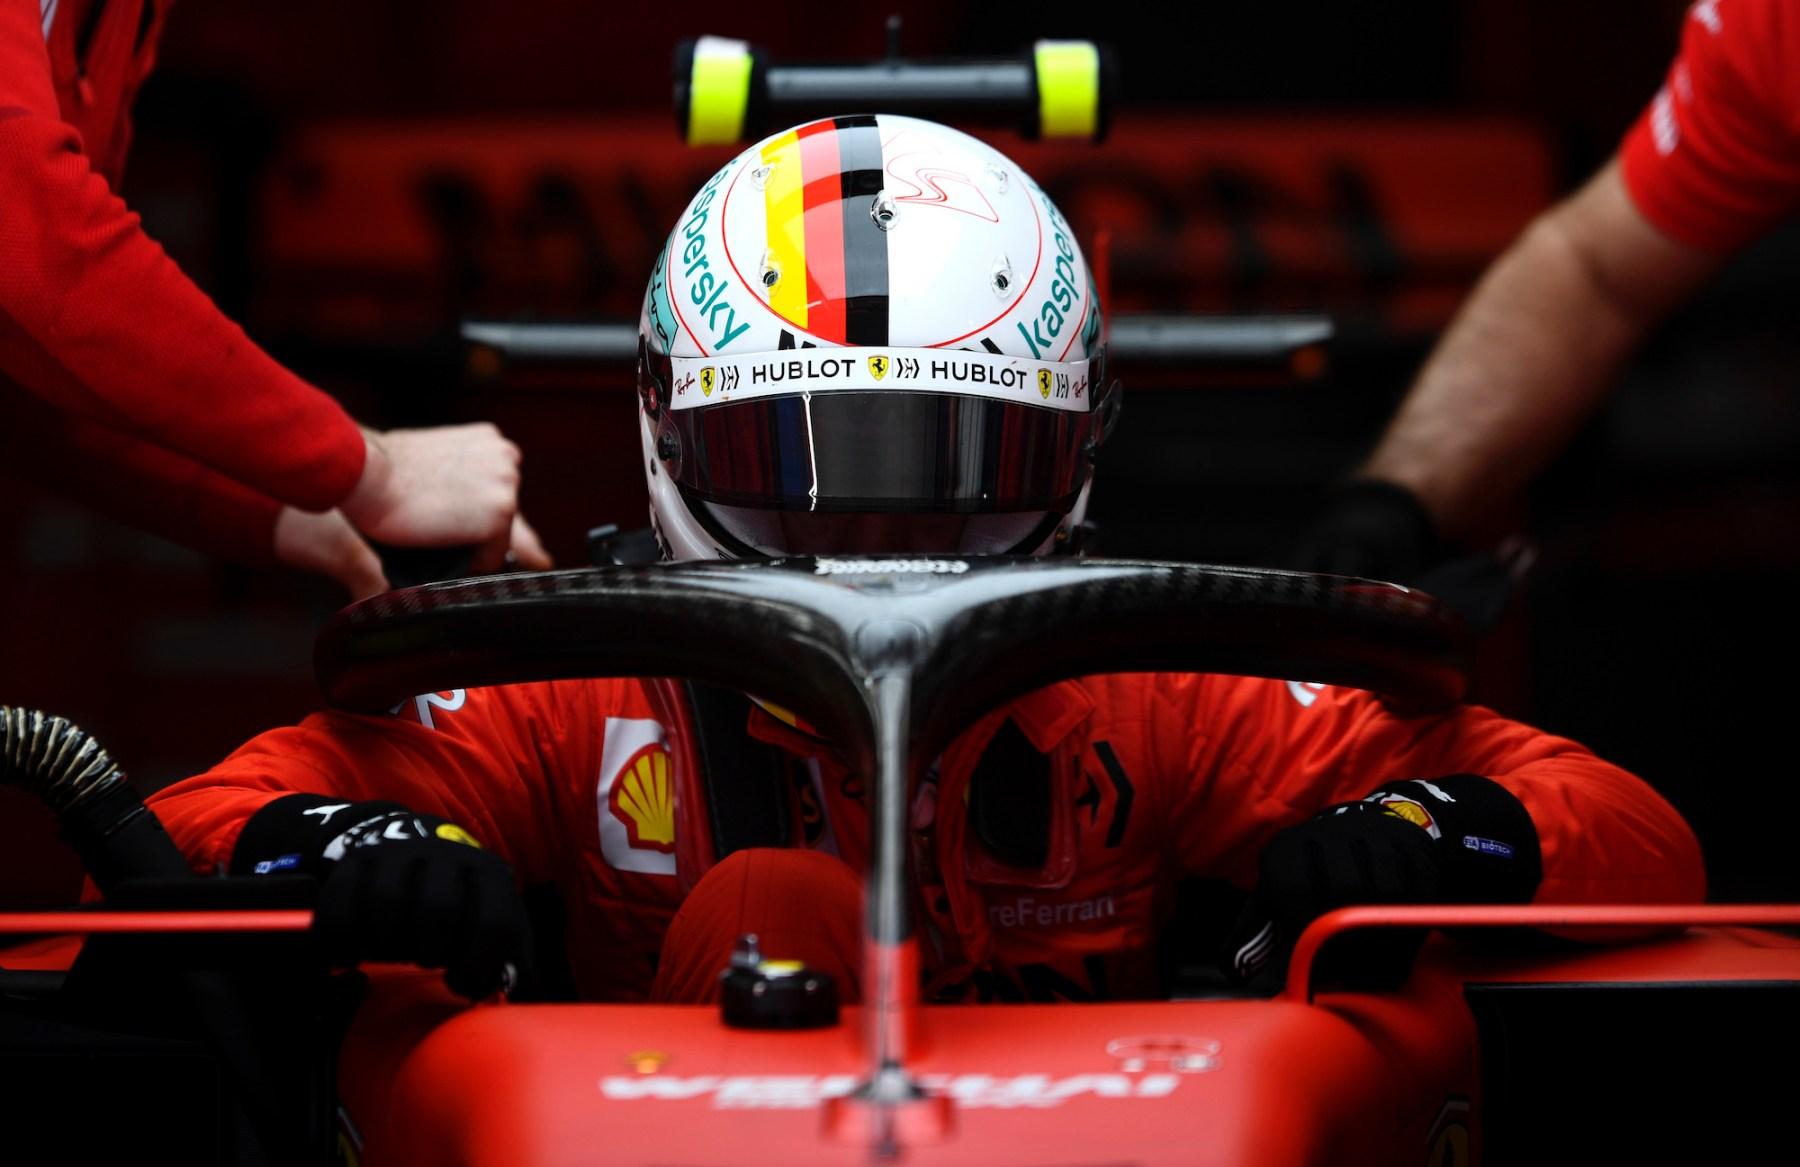 Sebastian Vettel sits in his car before a race